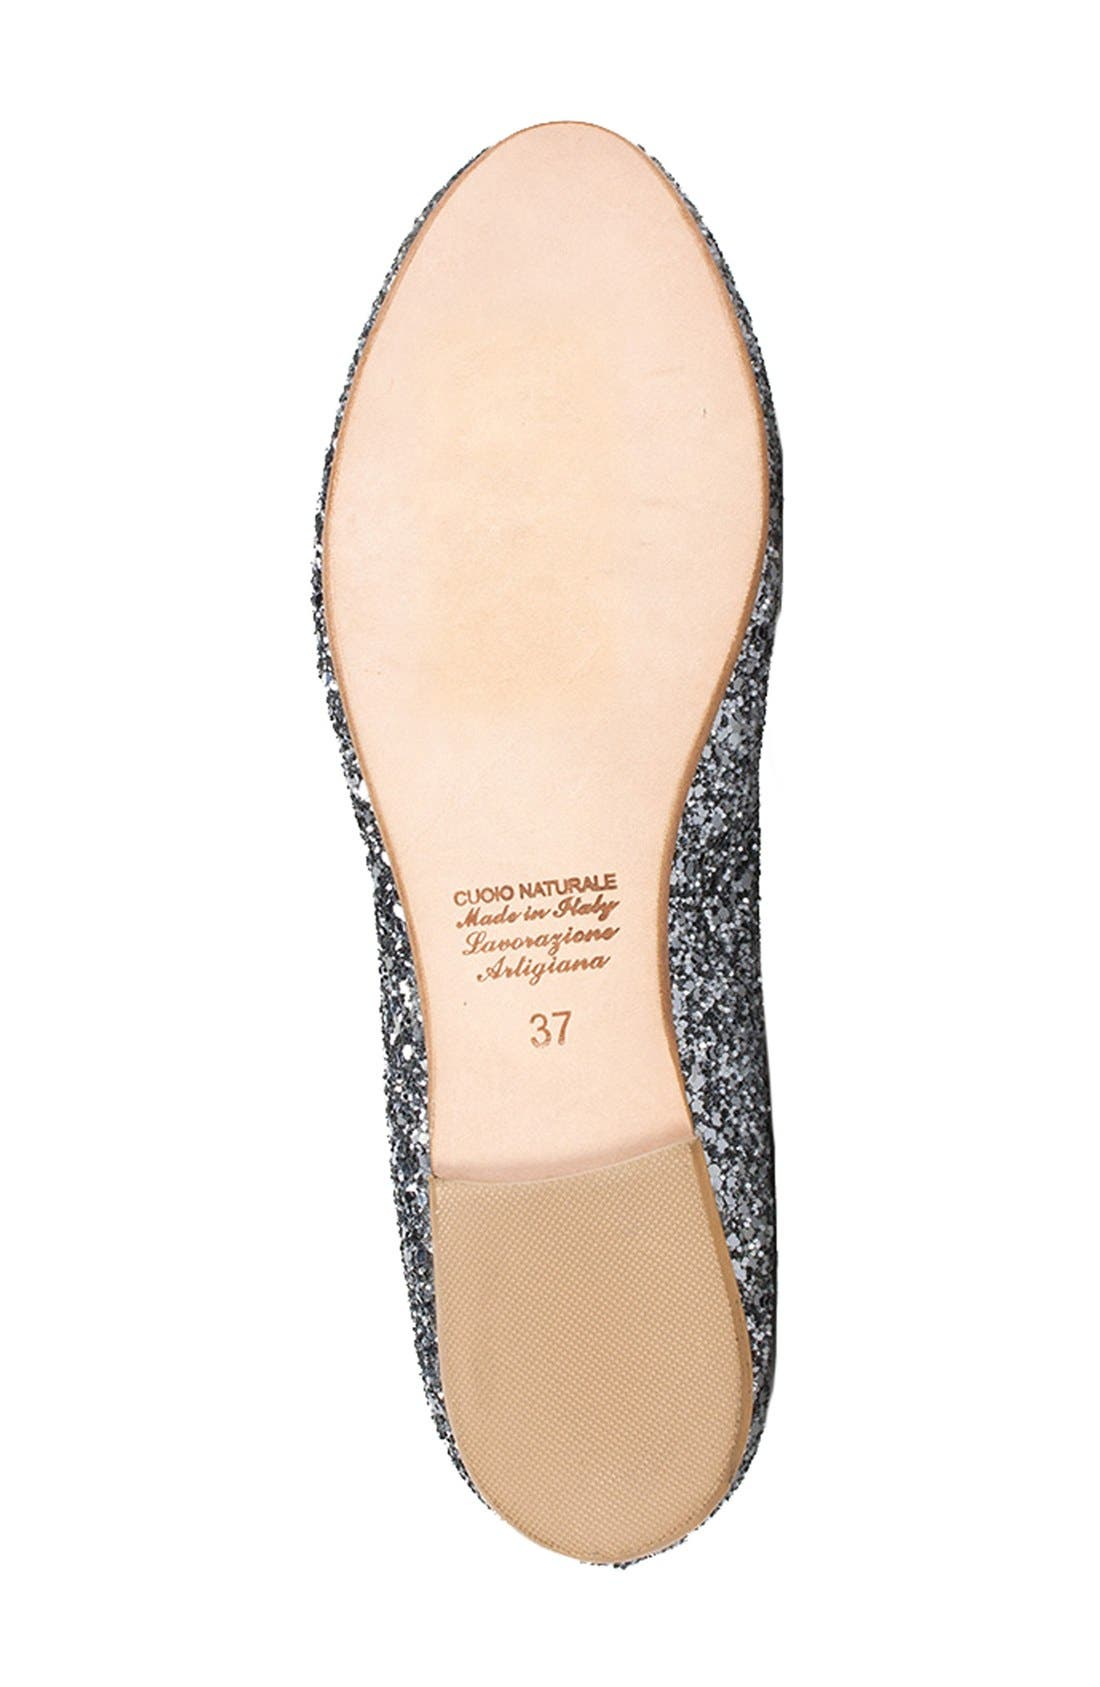 Summit 'Kendall' Ballet Flat,                             Alternate thumbnail 46, color,